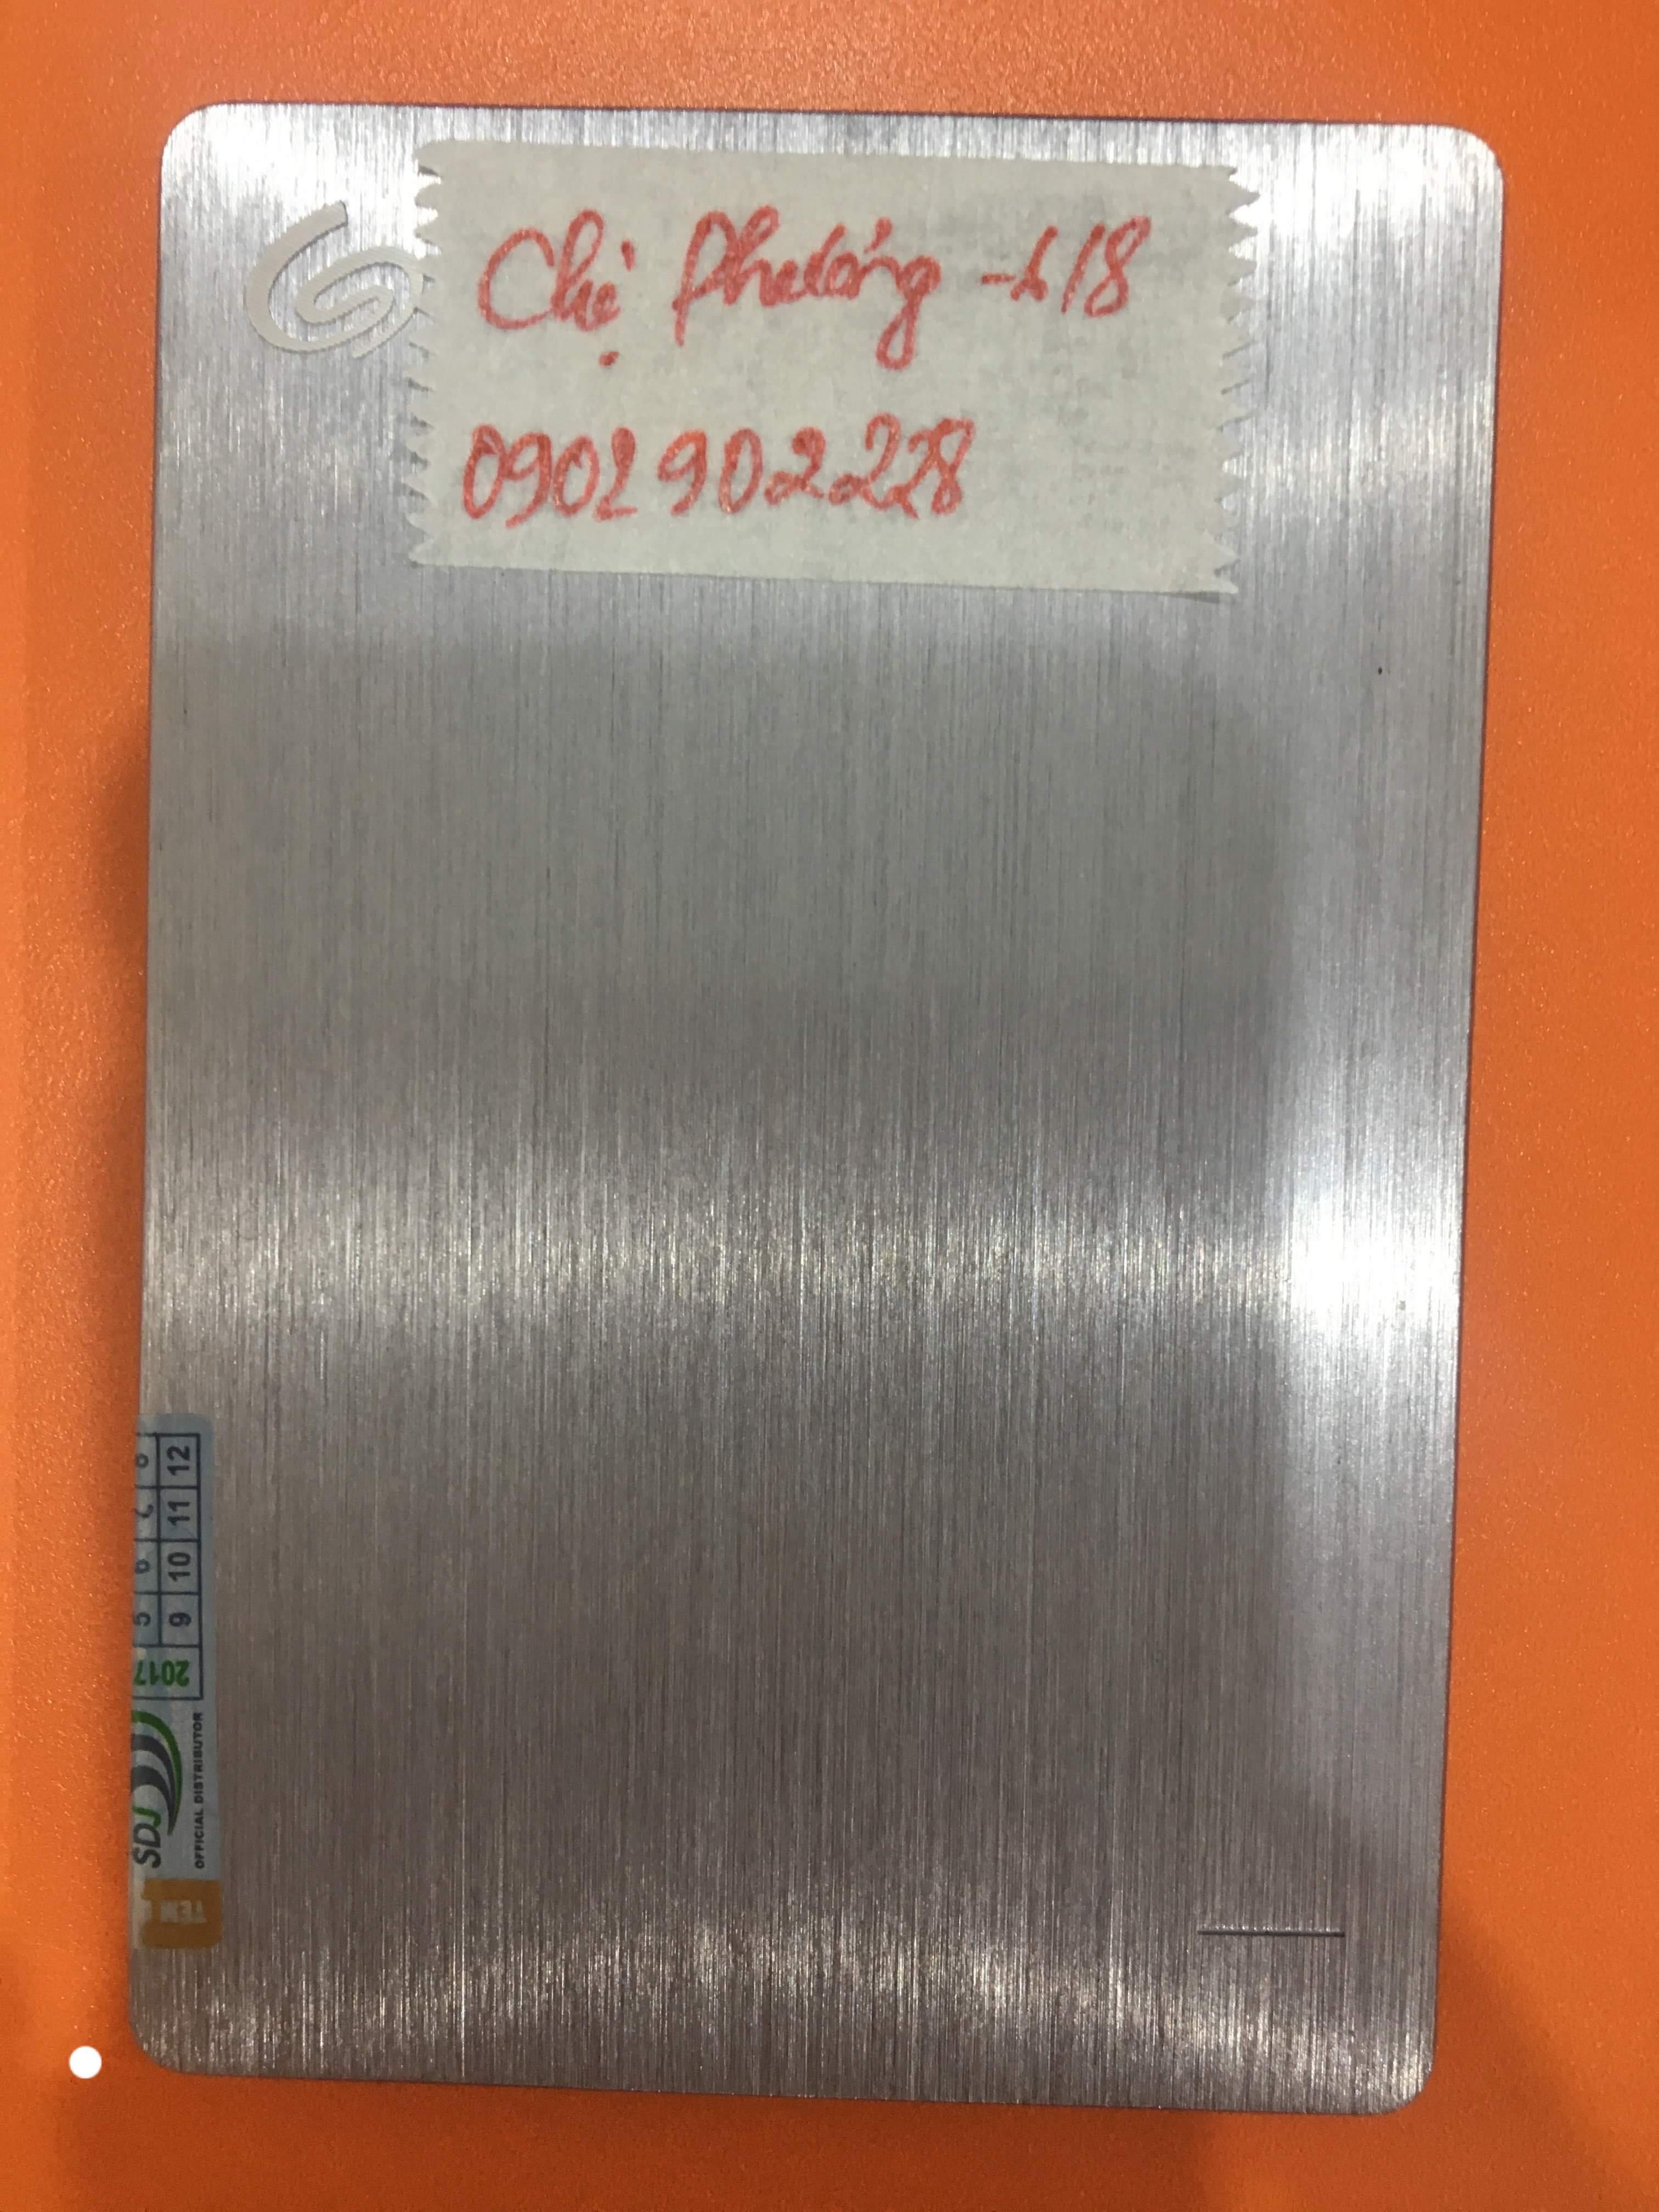 Phục hồi dữ liệu ổ cứng Seagate 1TB format nhầm 24/08/2019 - cuumaytinh